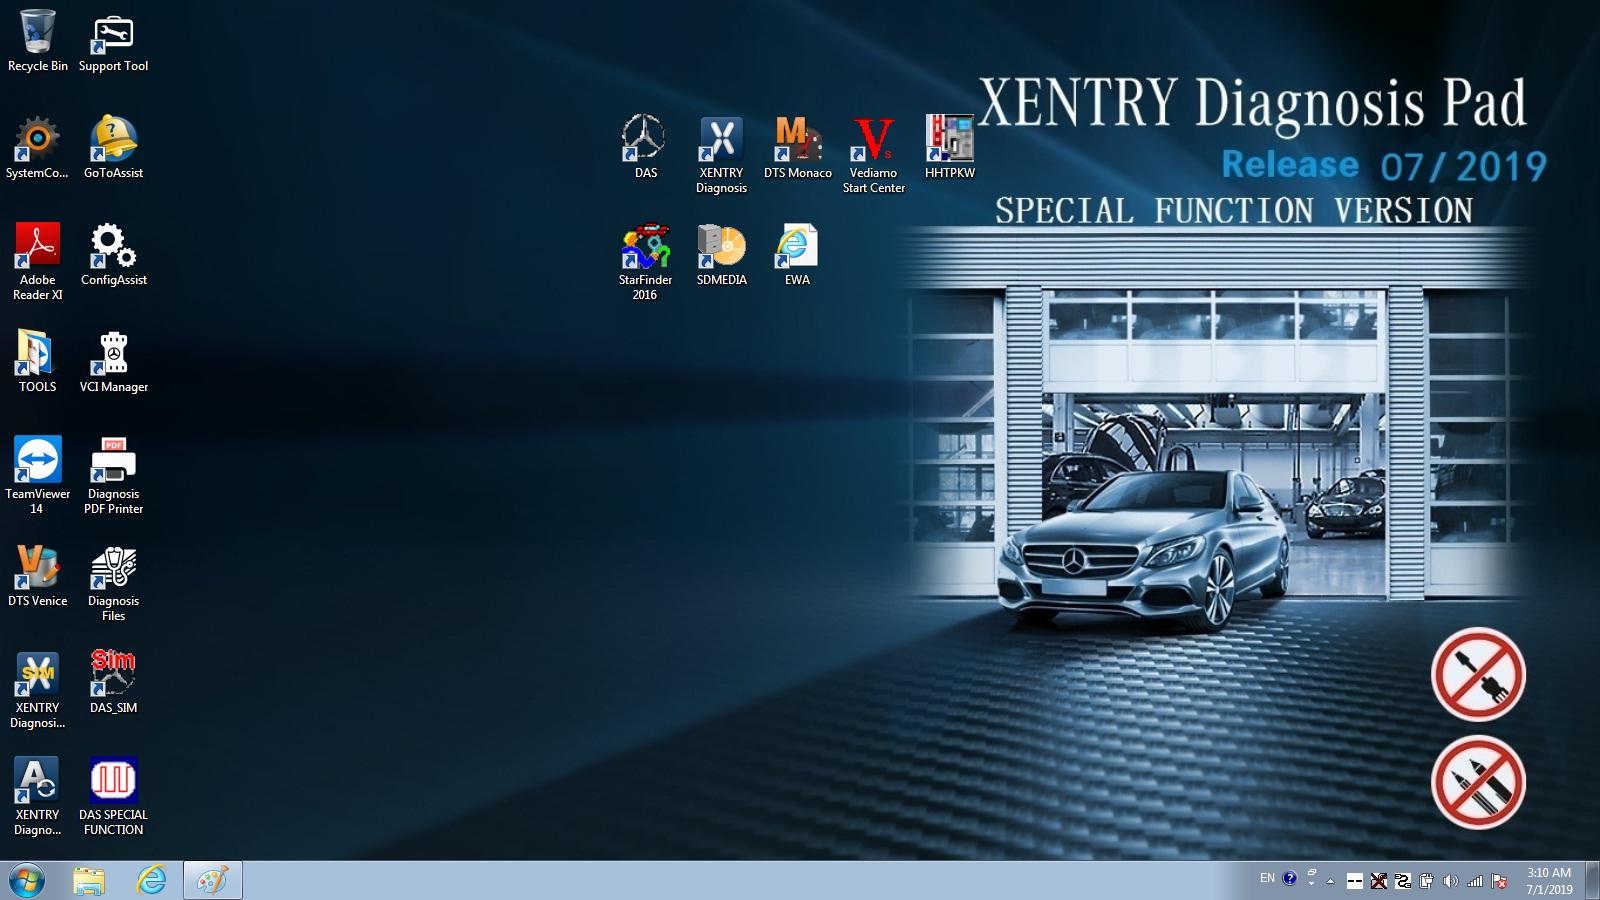 US$238 00 - Lenovo T410/T420/ E49/ DELL E6420/ D630/EVG7 Laptop With